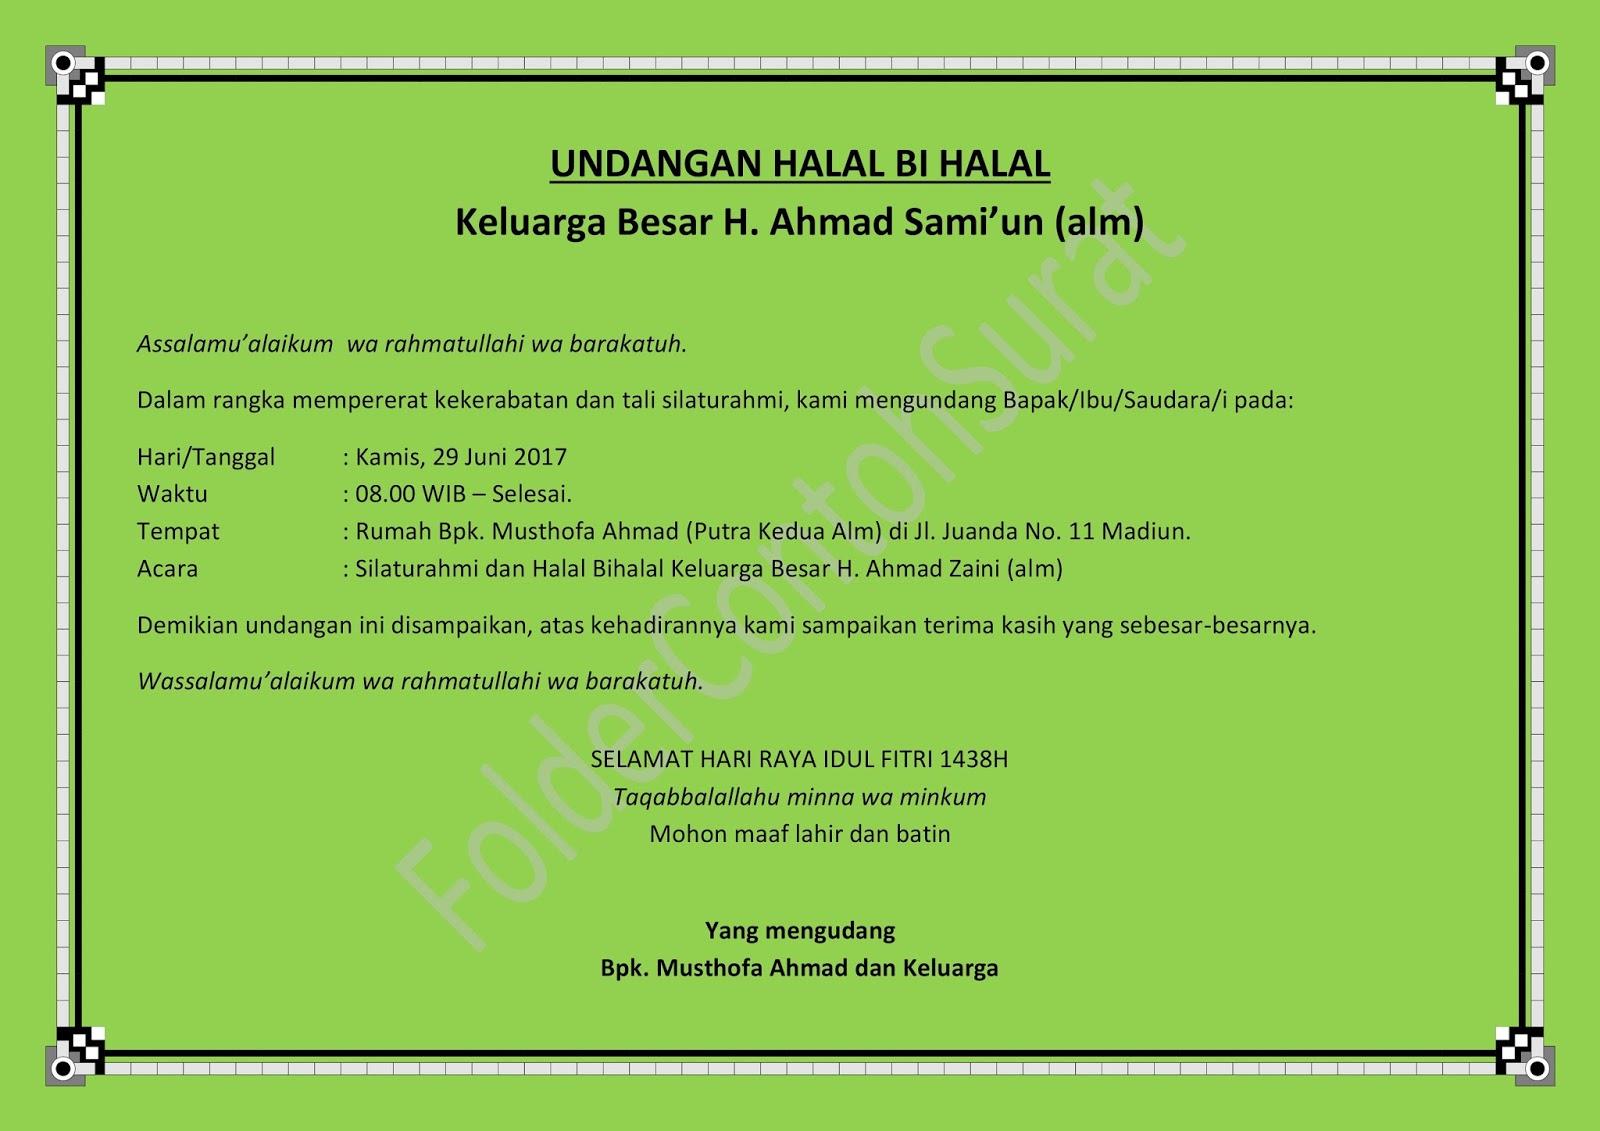 Contoh Surat Undangan Halal Bihalal Idul Fitri | Folder ...